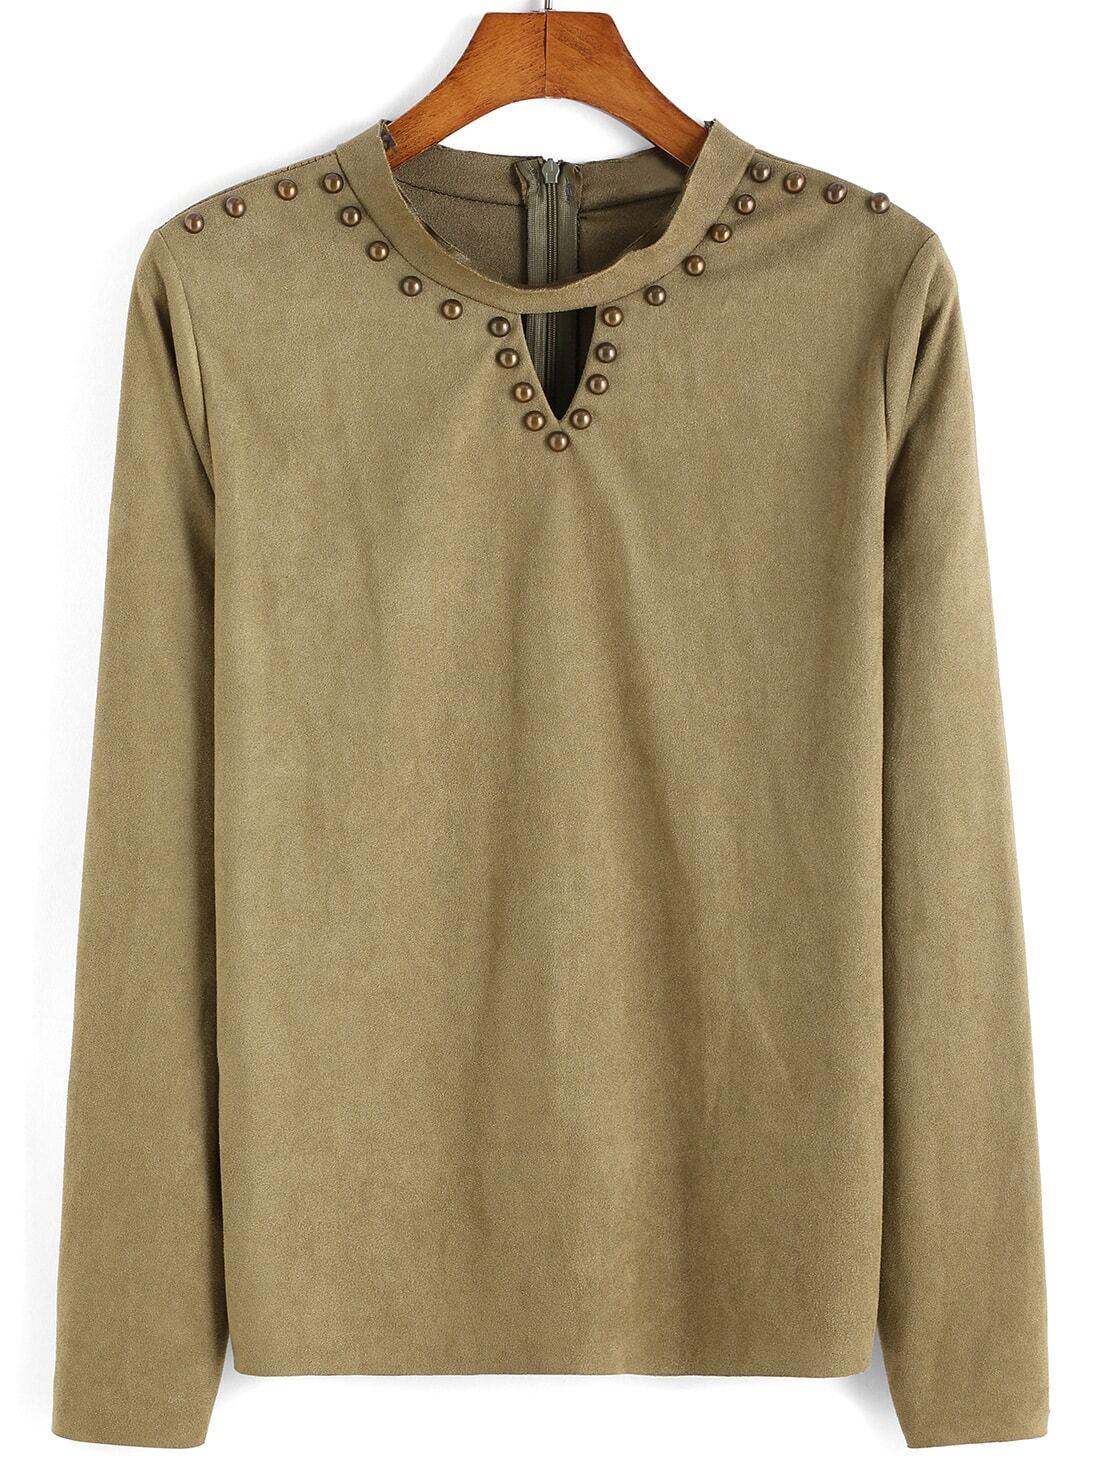 Long Sleeve V Cut Rivets T Shirtfor Women Romwe